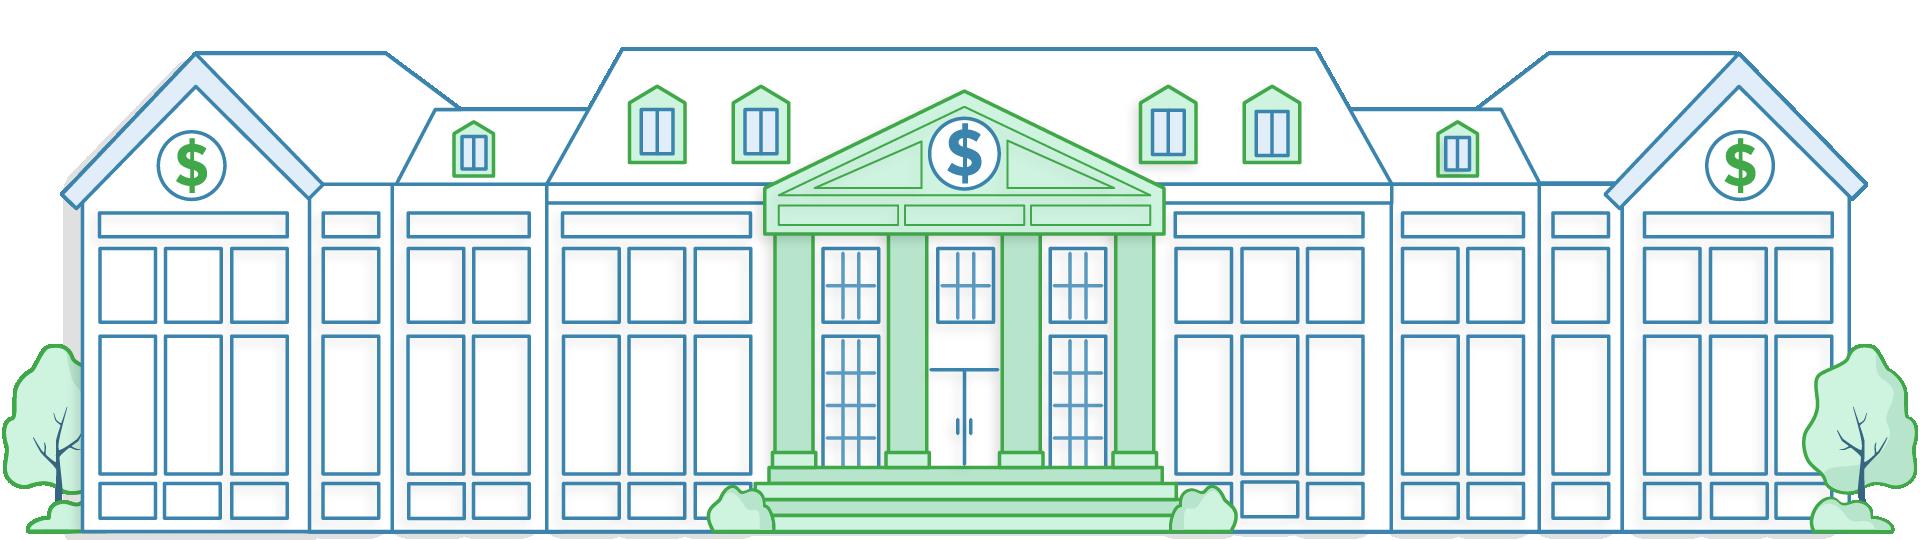 Illustration of a large bank building